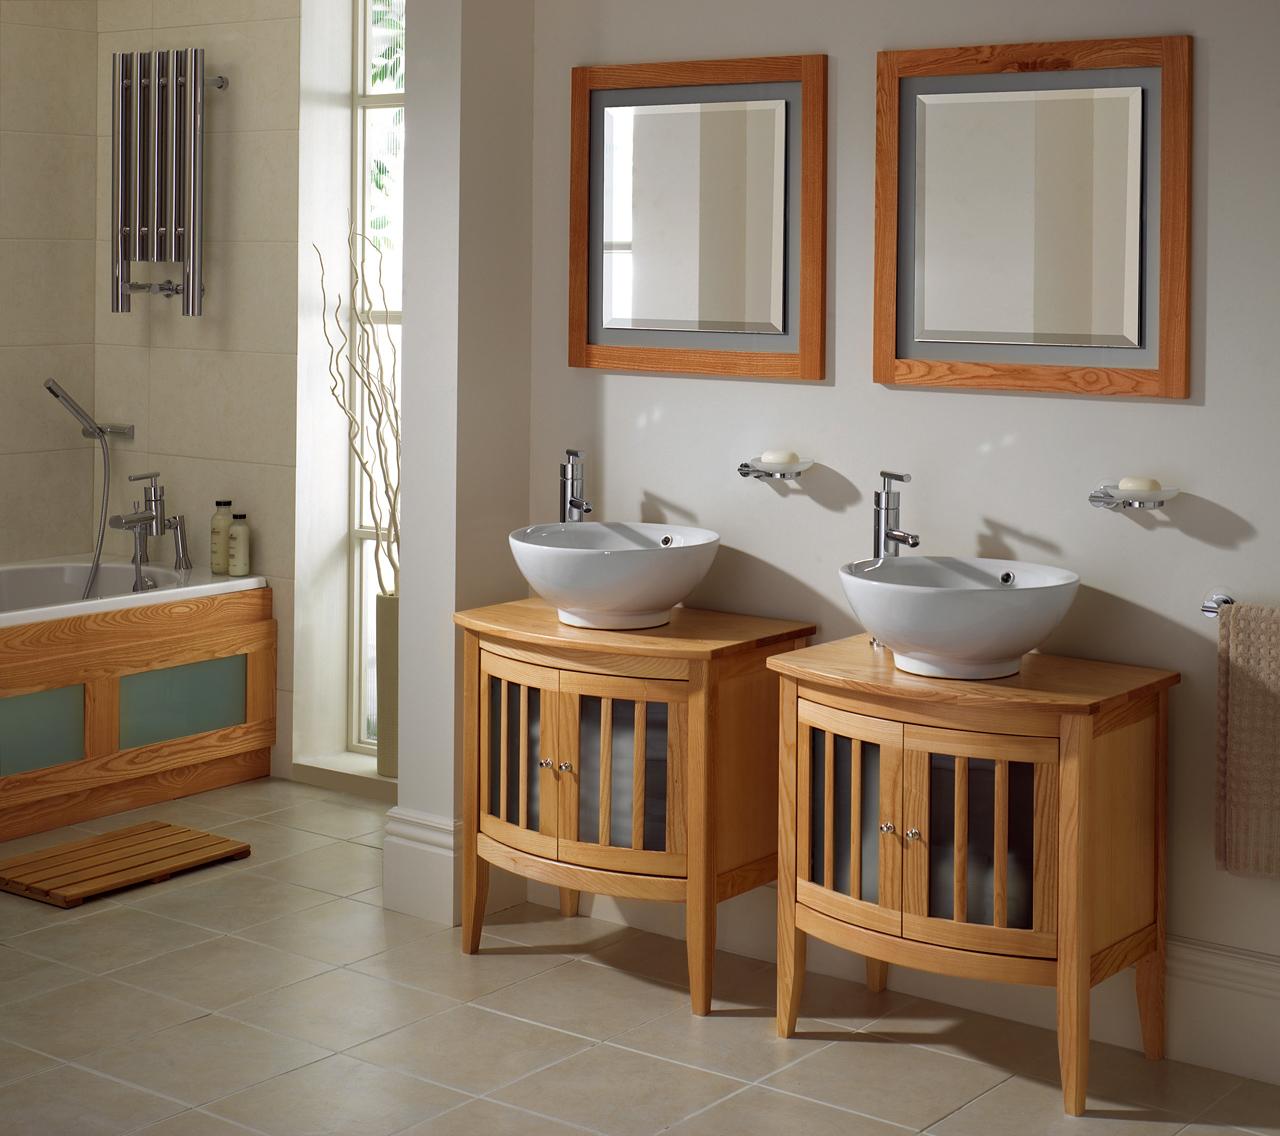 Classic Bathrooms: Imperial Bathrooms - Linea-Main